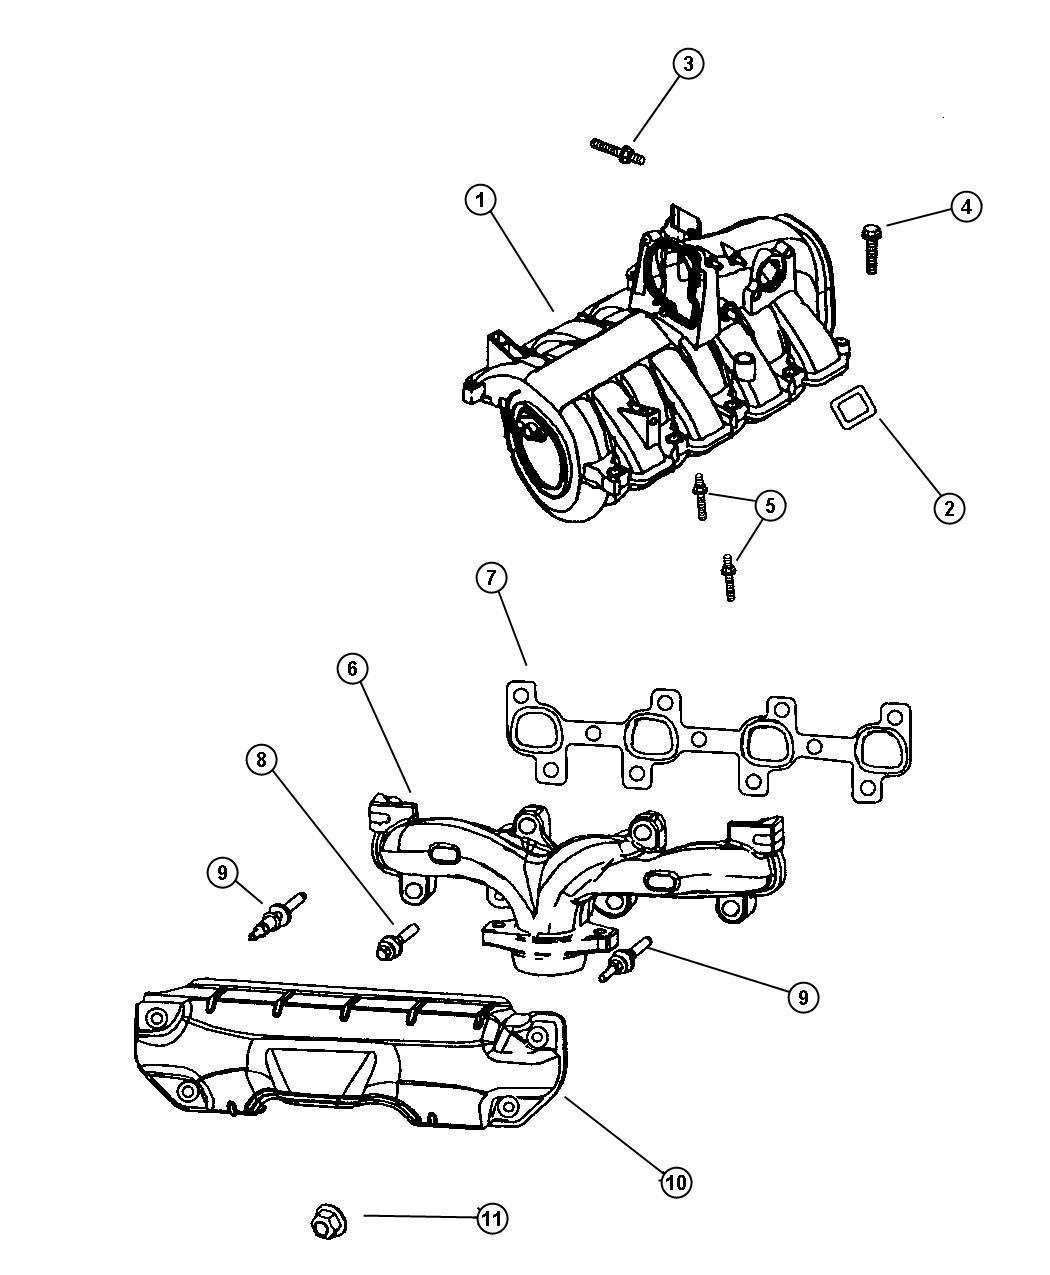 Jeep Grand Cherokee Manifold Exhaust Left